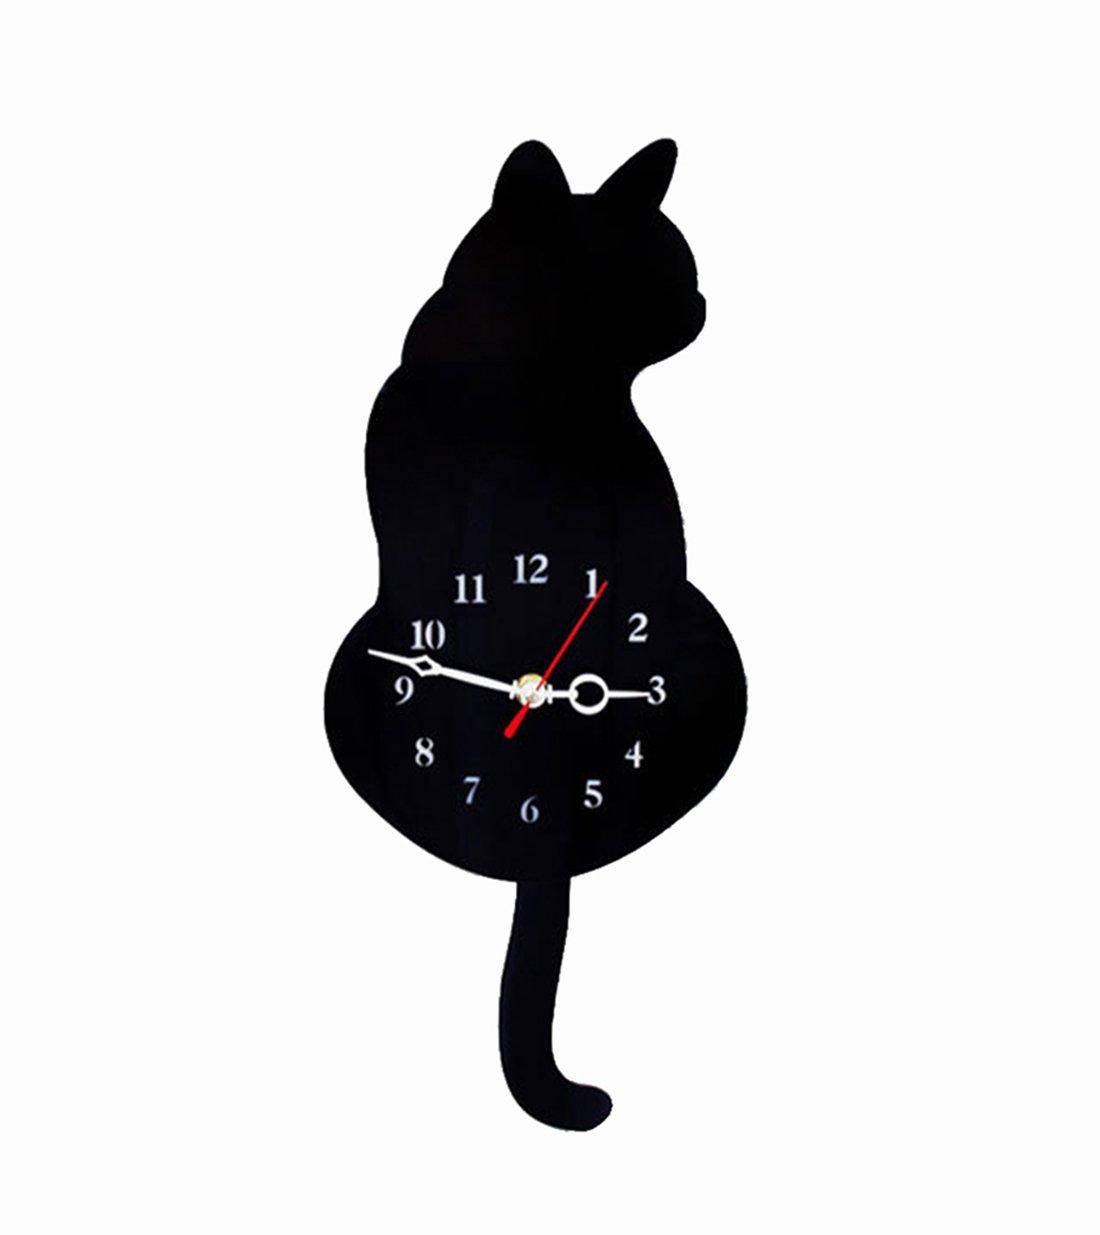 Besttime Home Decor Swing Pendulum Wall Clock Cute Cat Design For Living Room,Office,Hotel(Black)